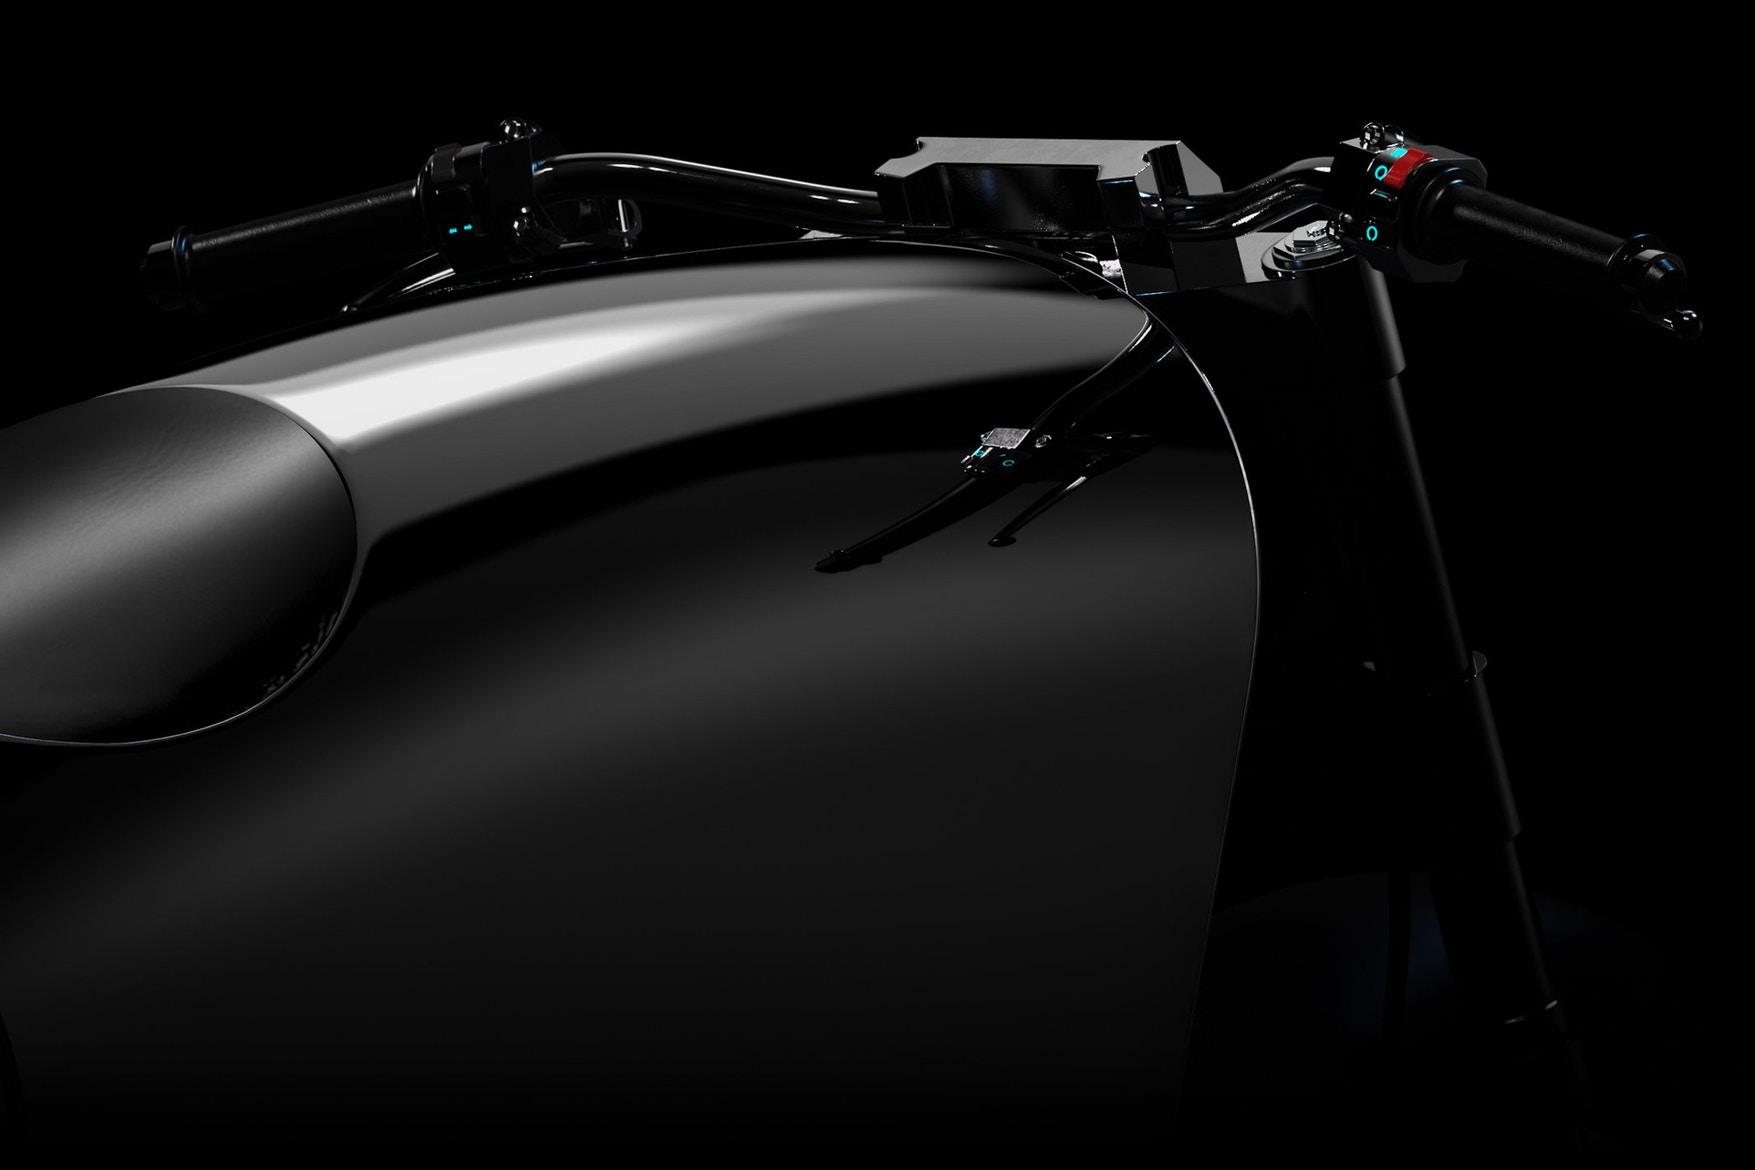 bandit9-the-odyssey-motorcycle-garage-4.jpg